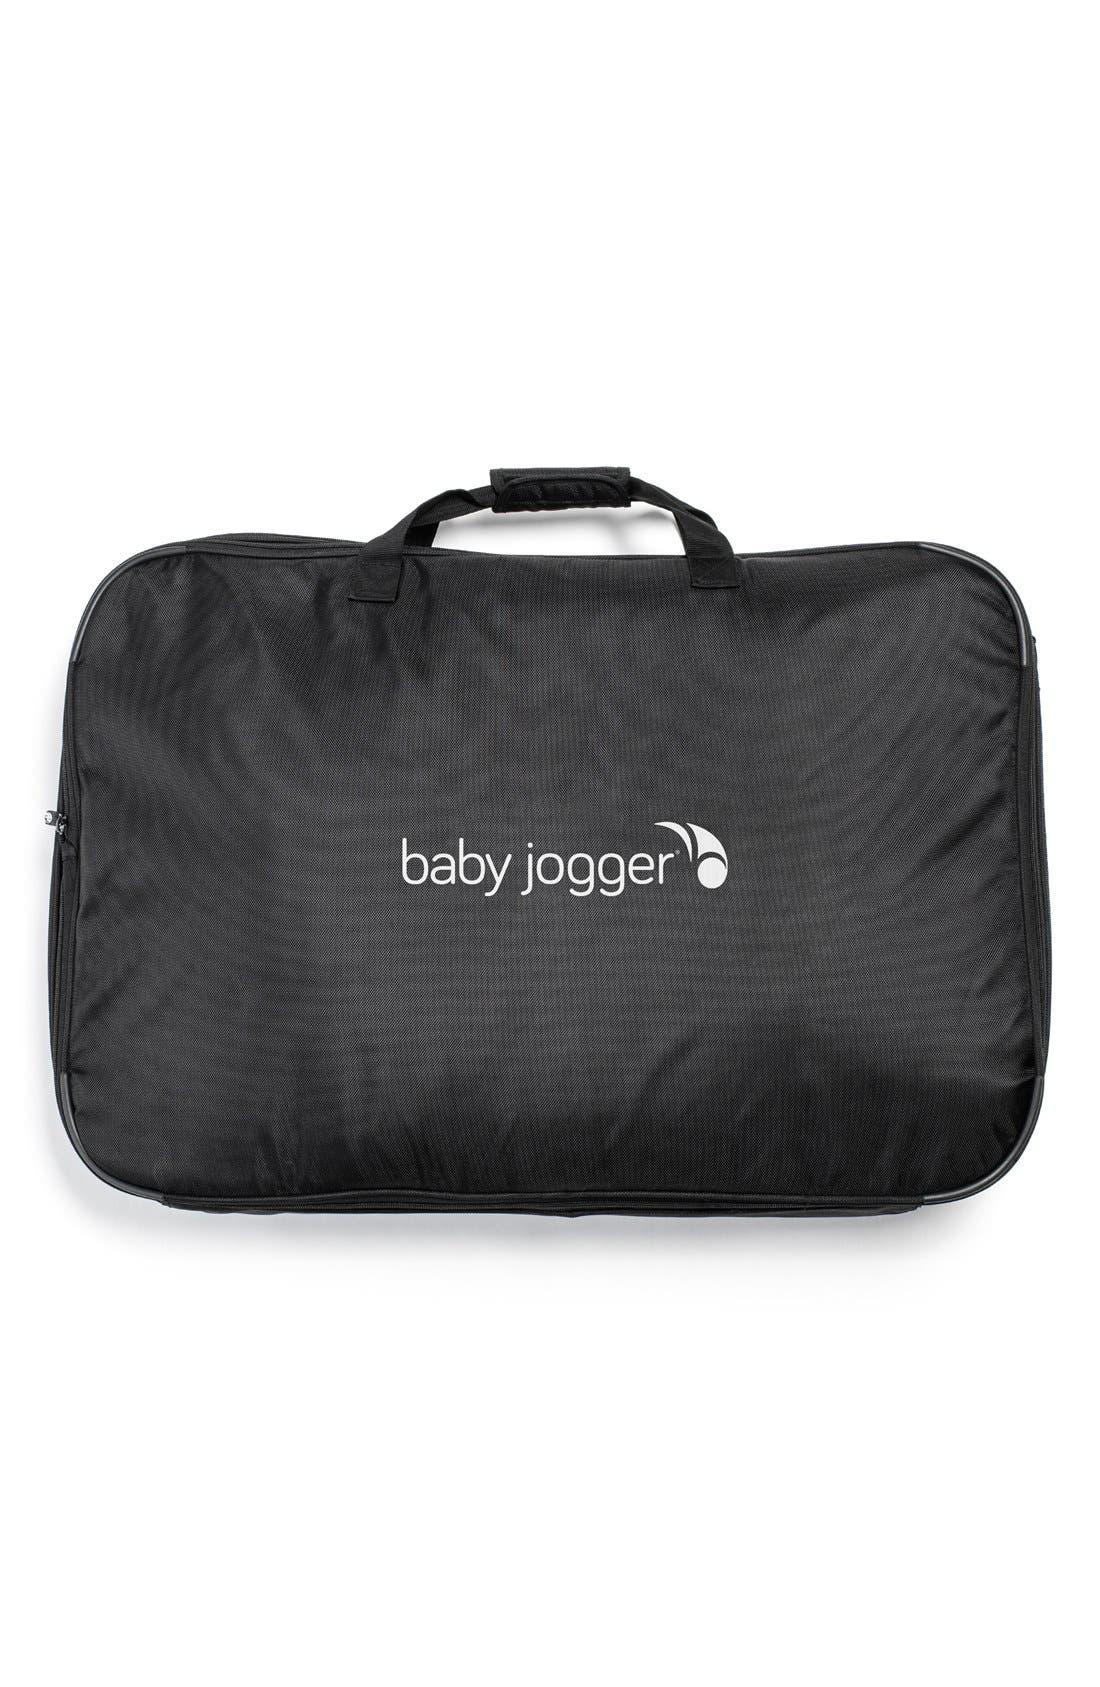 Alternate Image 1 Selected - Baby Jogger City Mini™ & City Mini GT™ Stroller Carry Bag